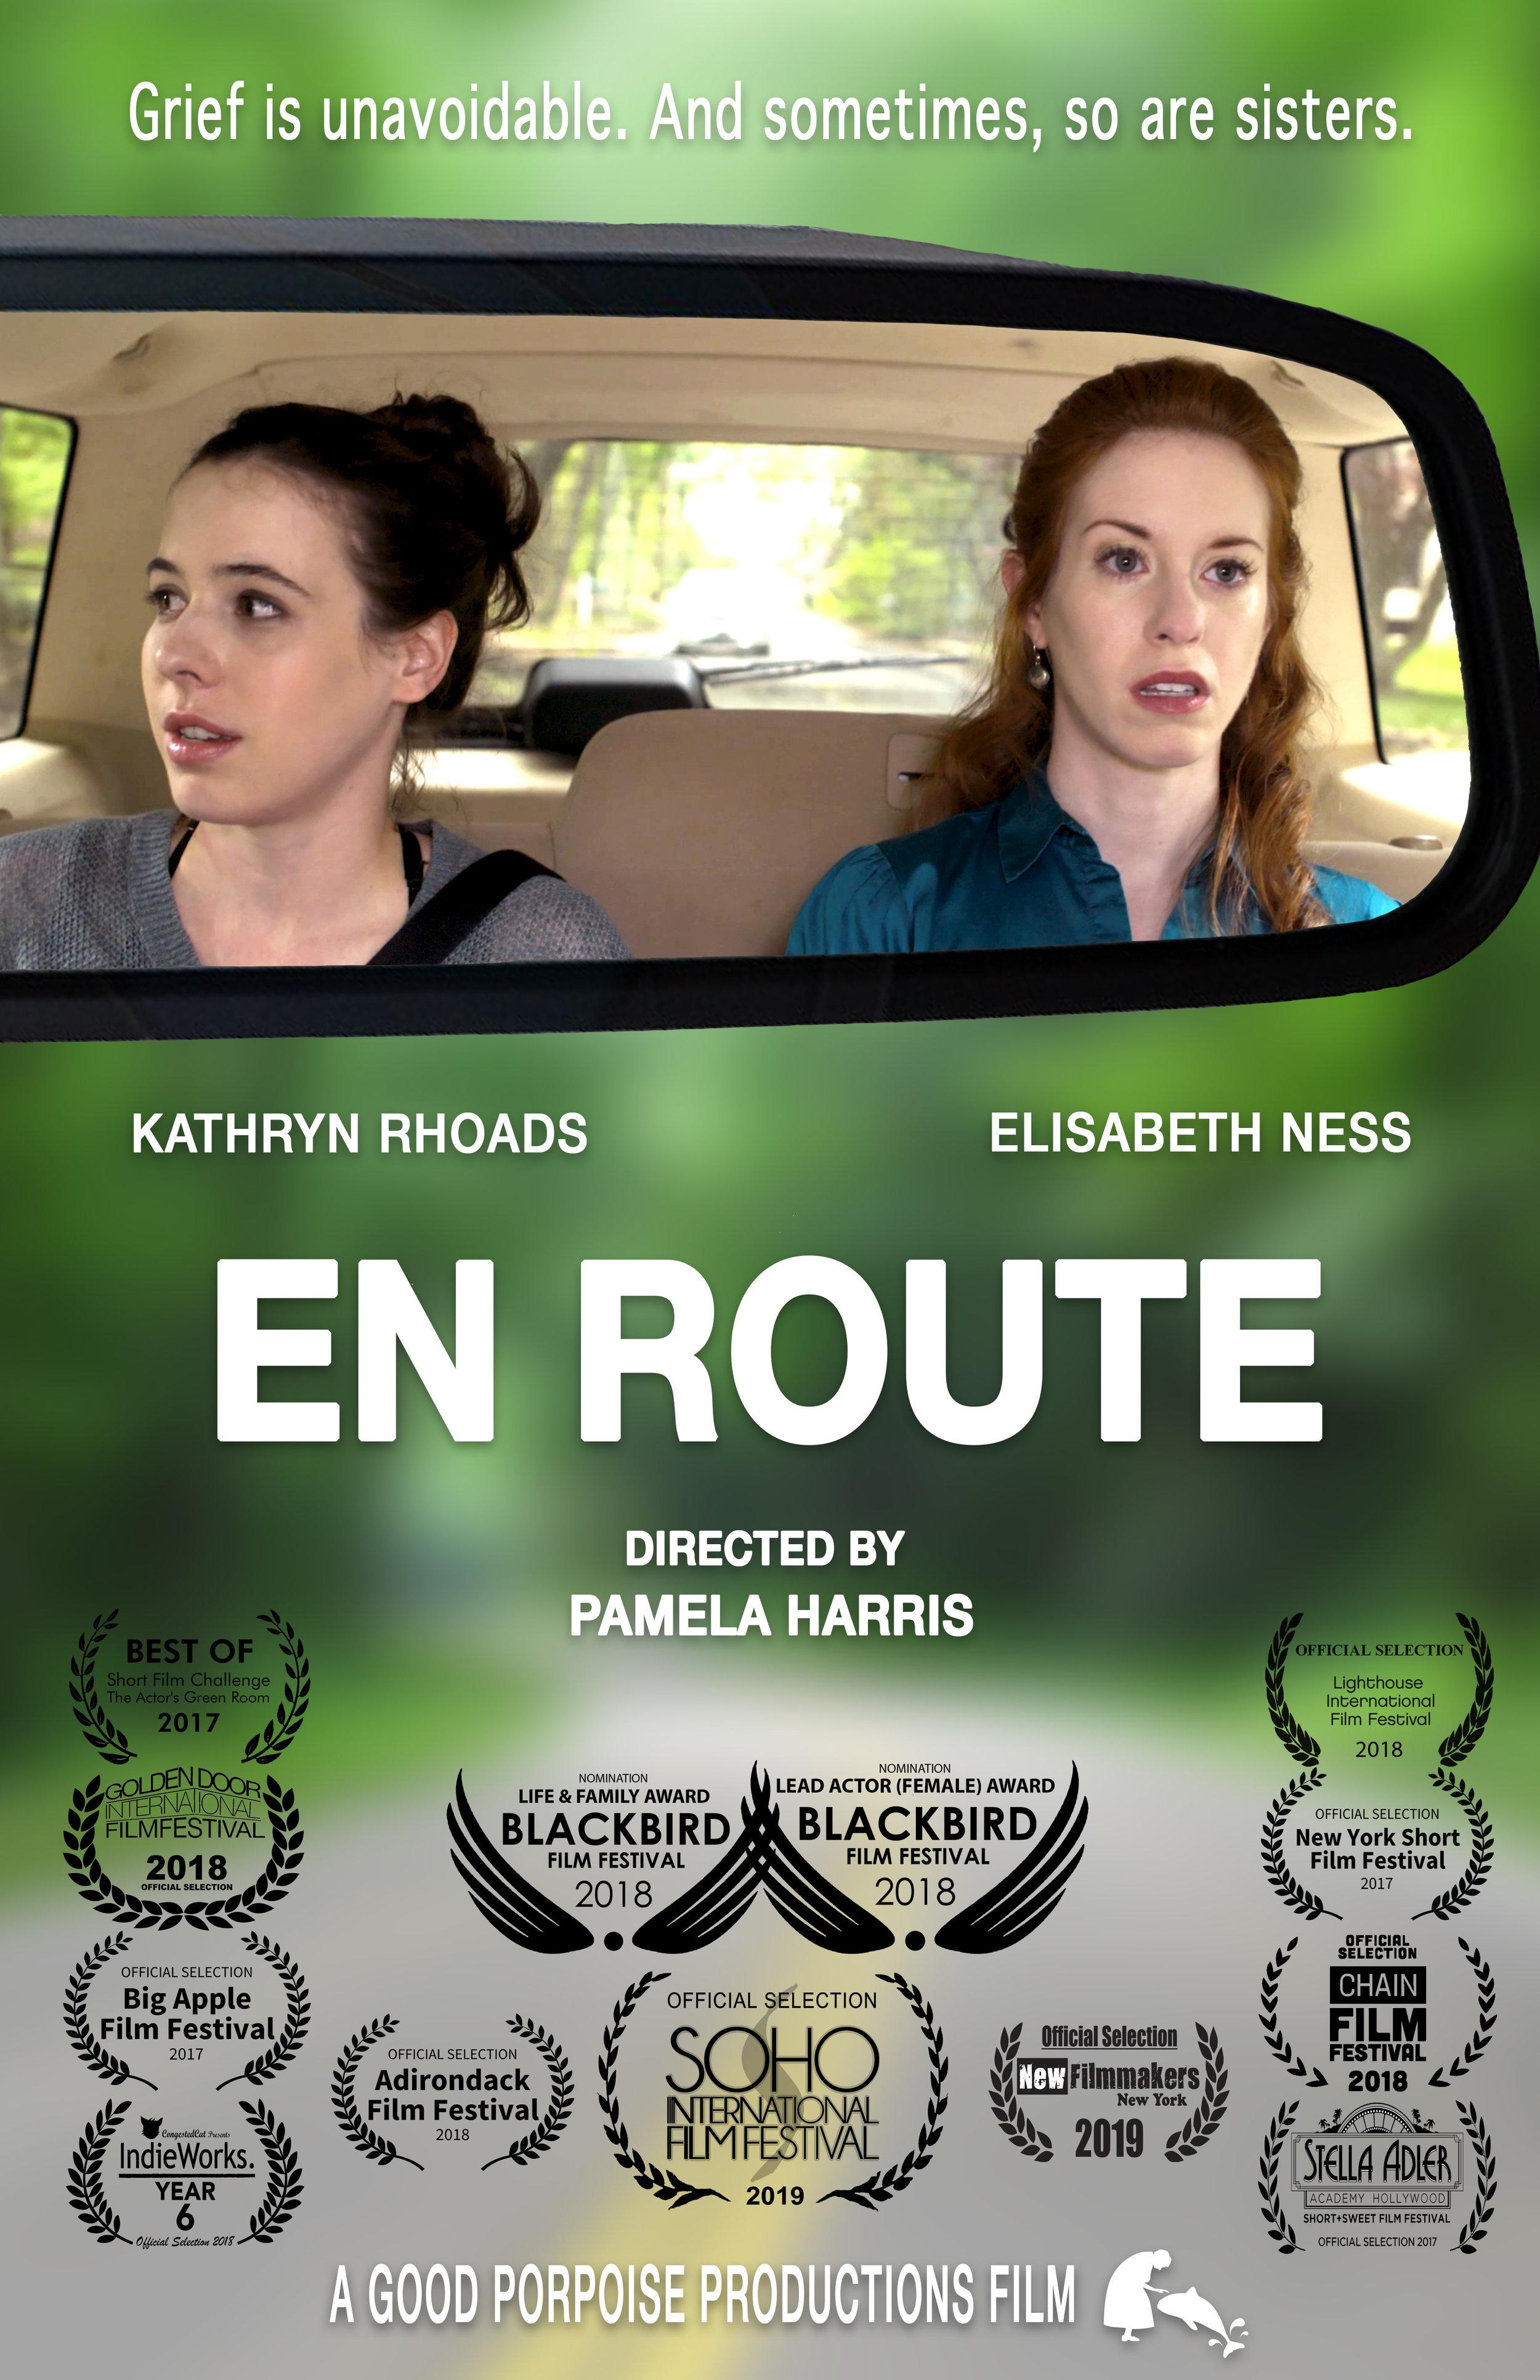 En Route Poster with Laurels